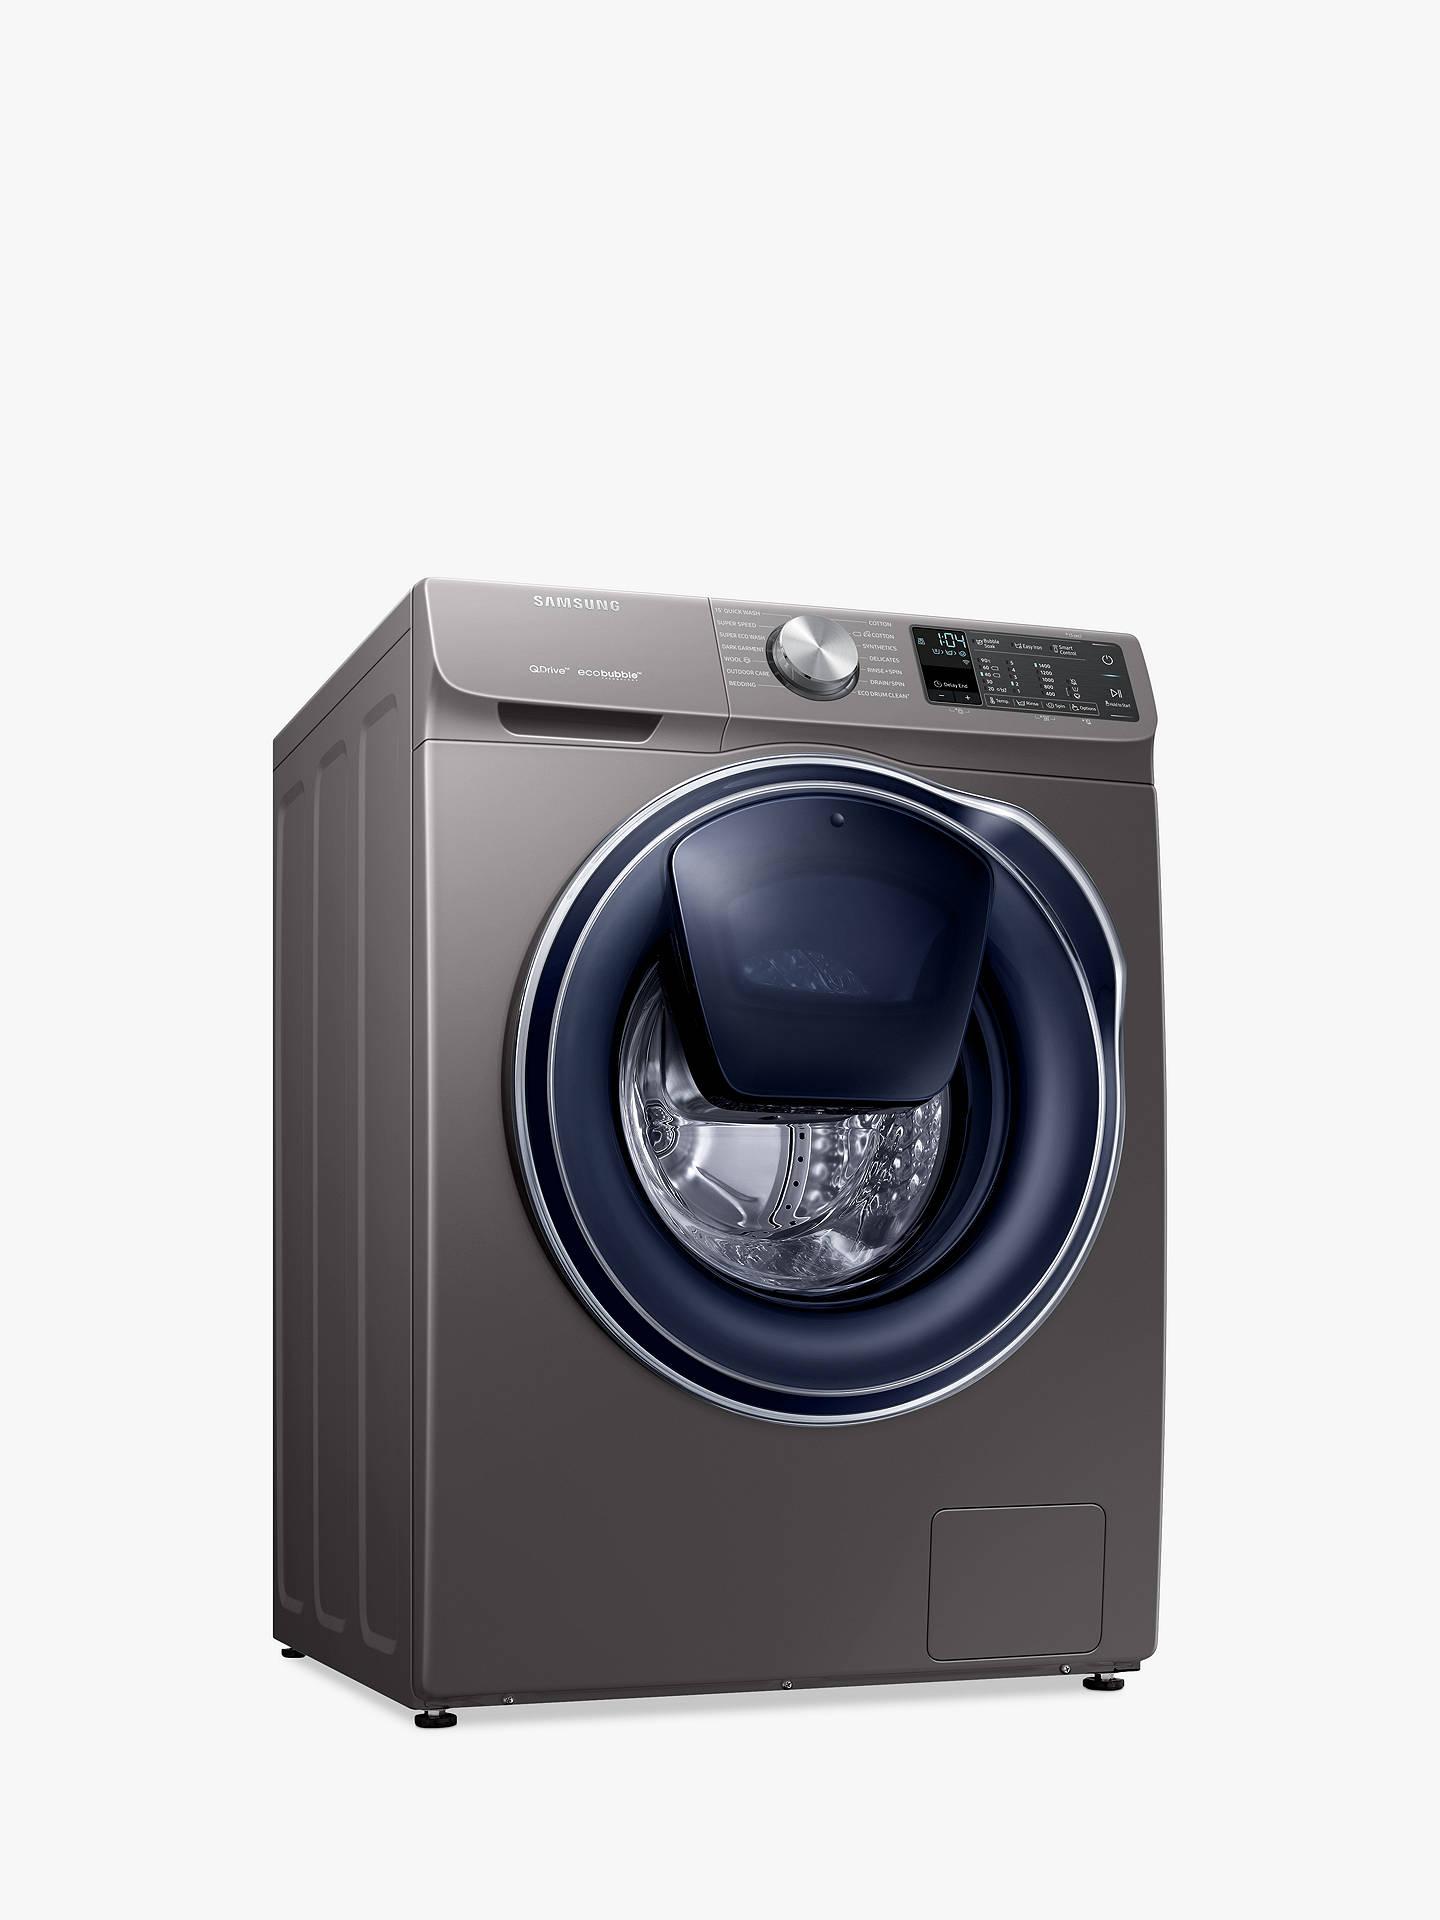 Samsung Quickdrive Ww90m645opoeu Freestanding Washing Machine 9kg